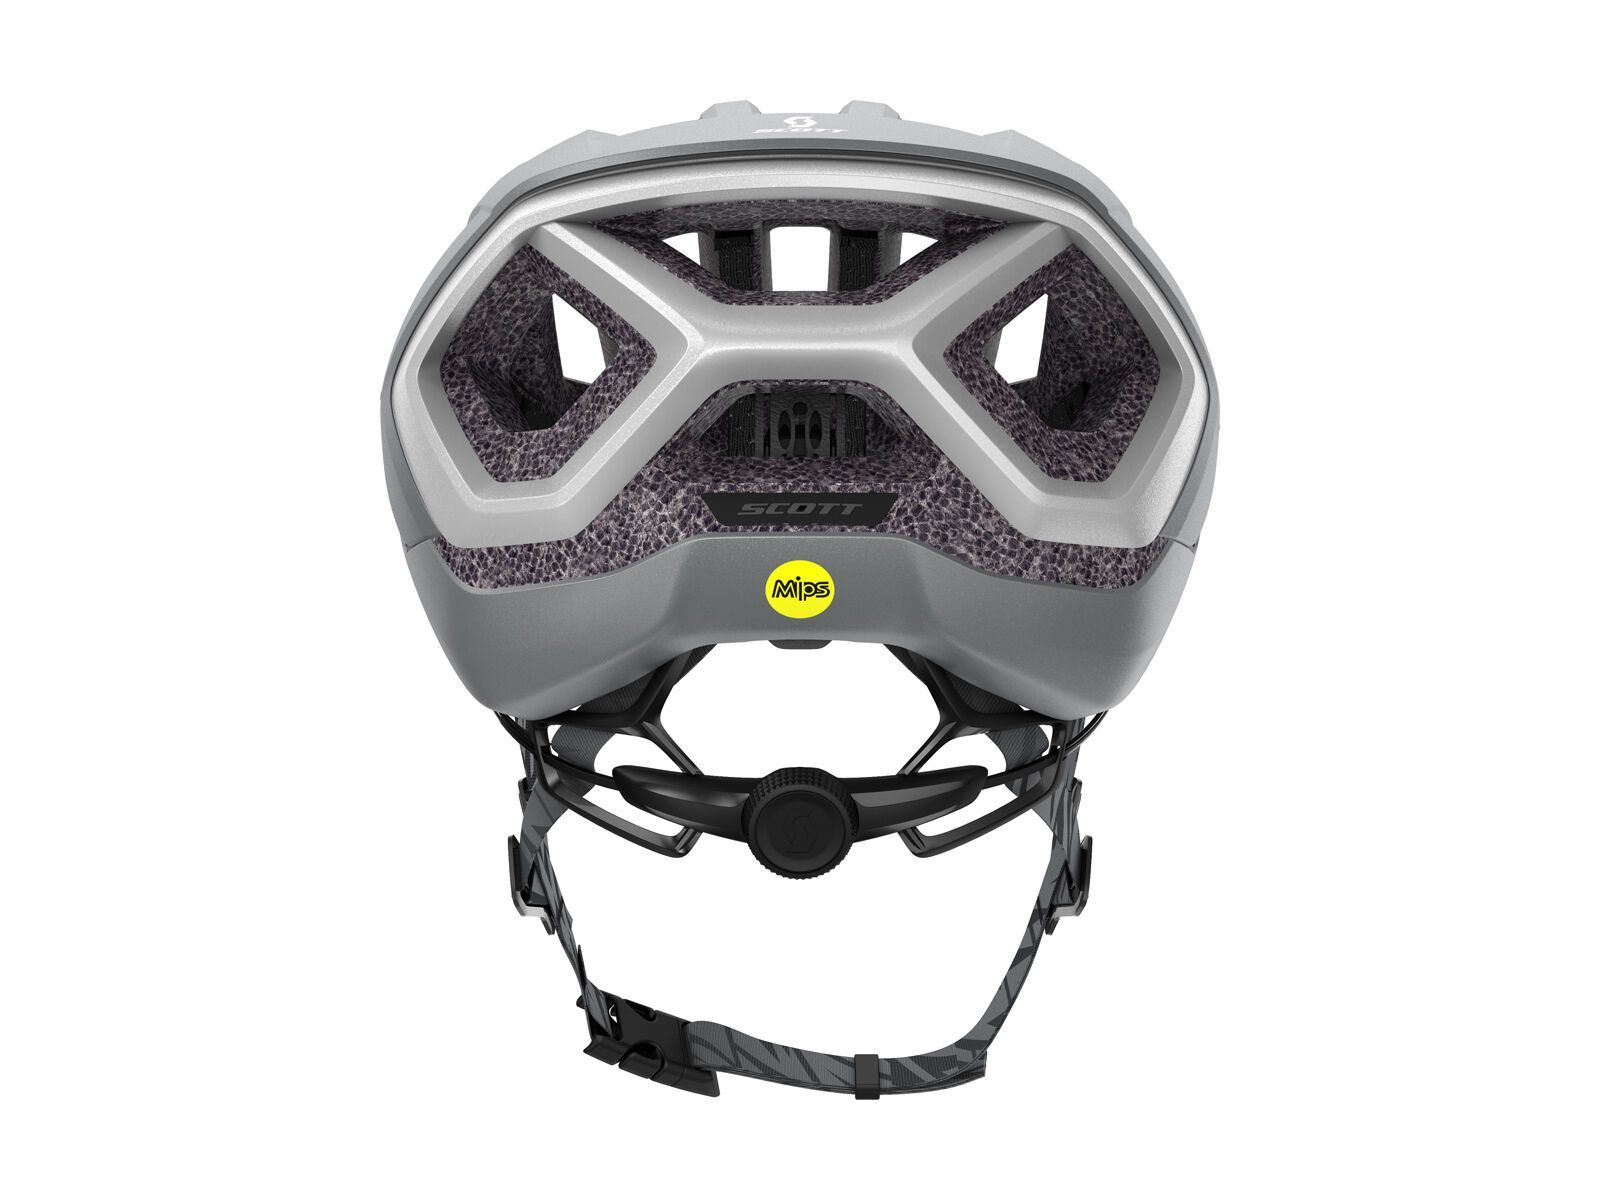 Scott Centric Plus Helmet, vogue silver/reflective | Bild 3